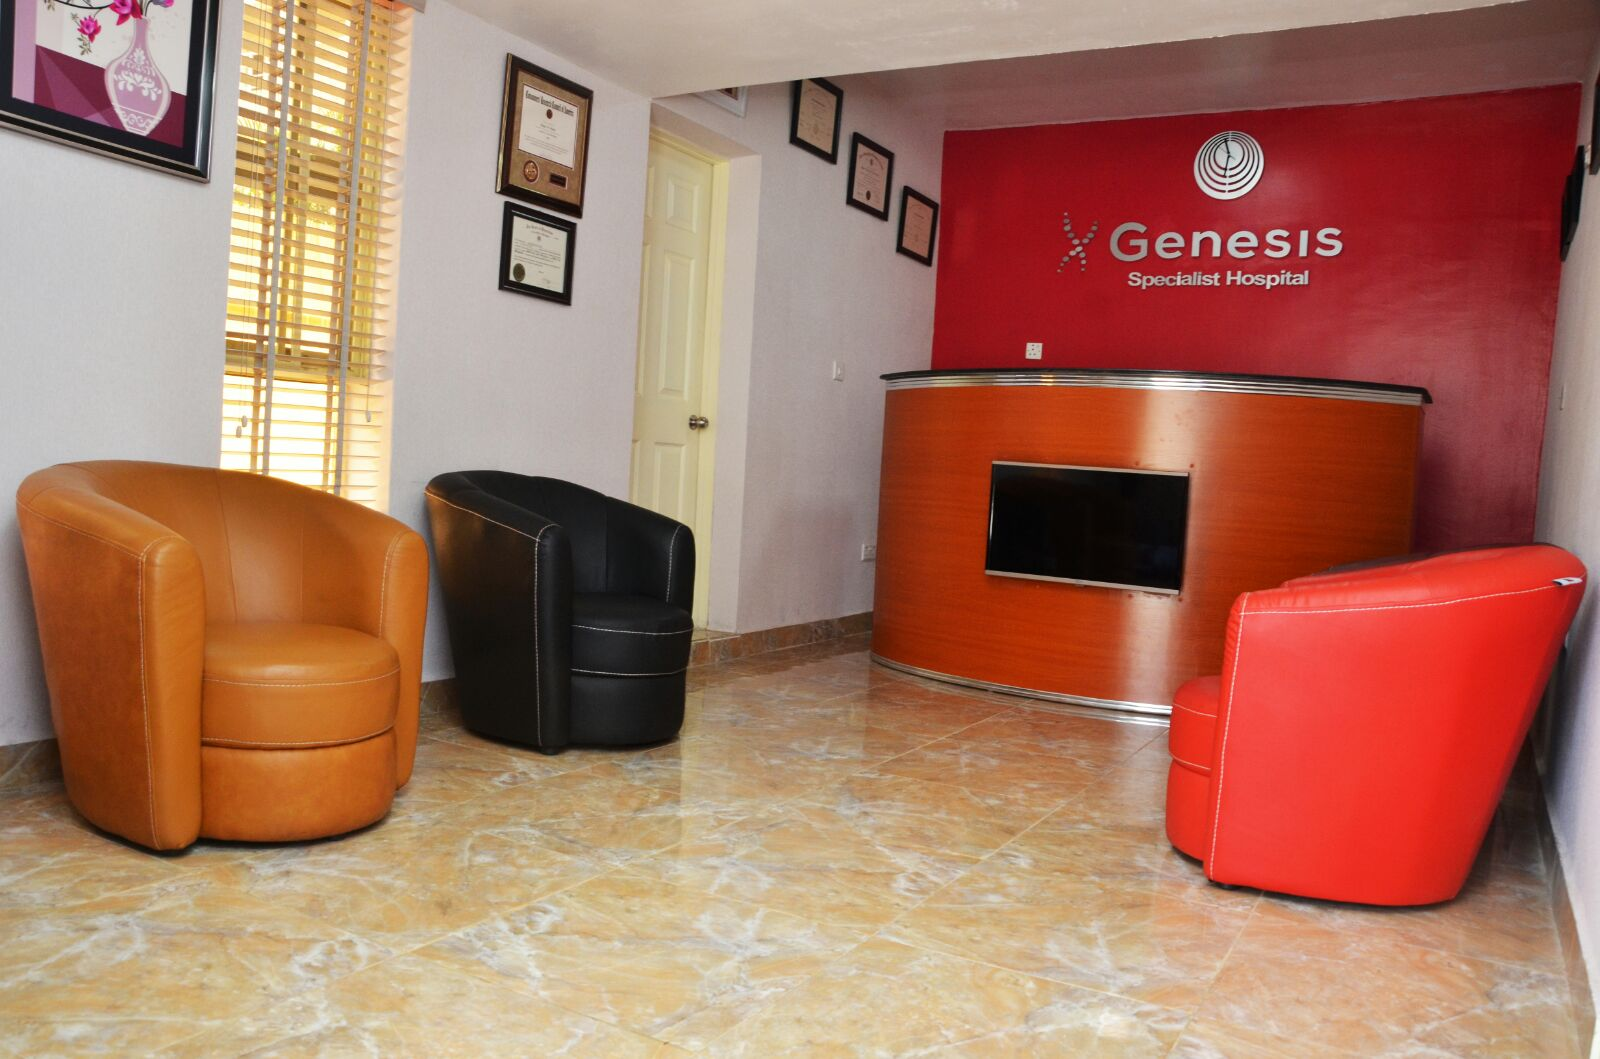 Waiting Room - Genesis Specialist Hospital